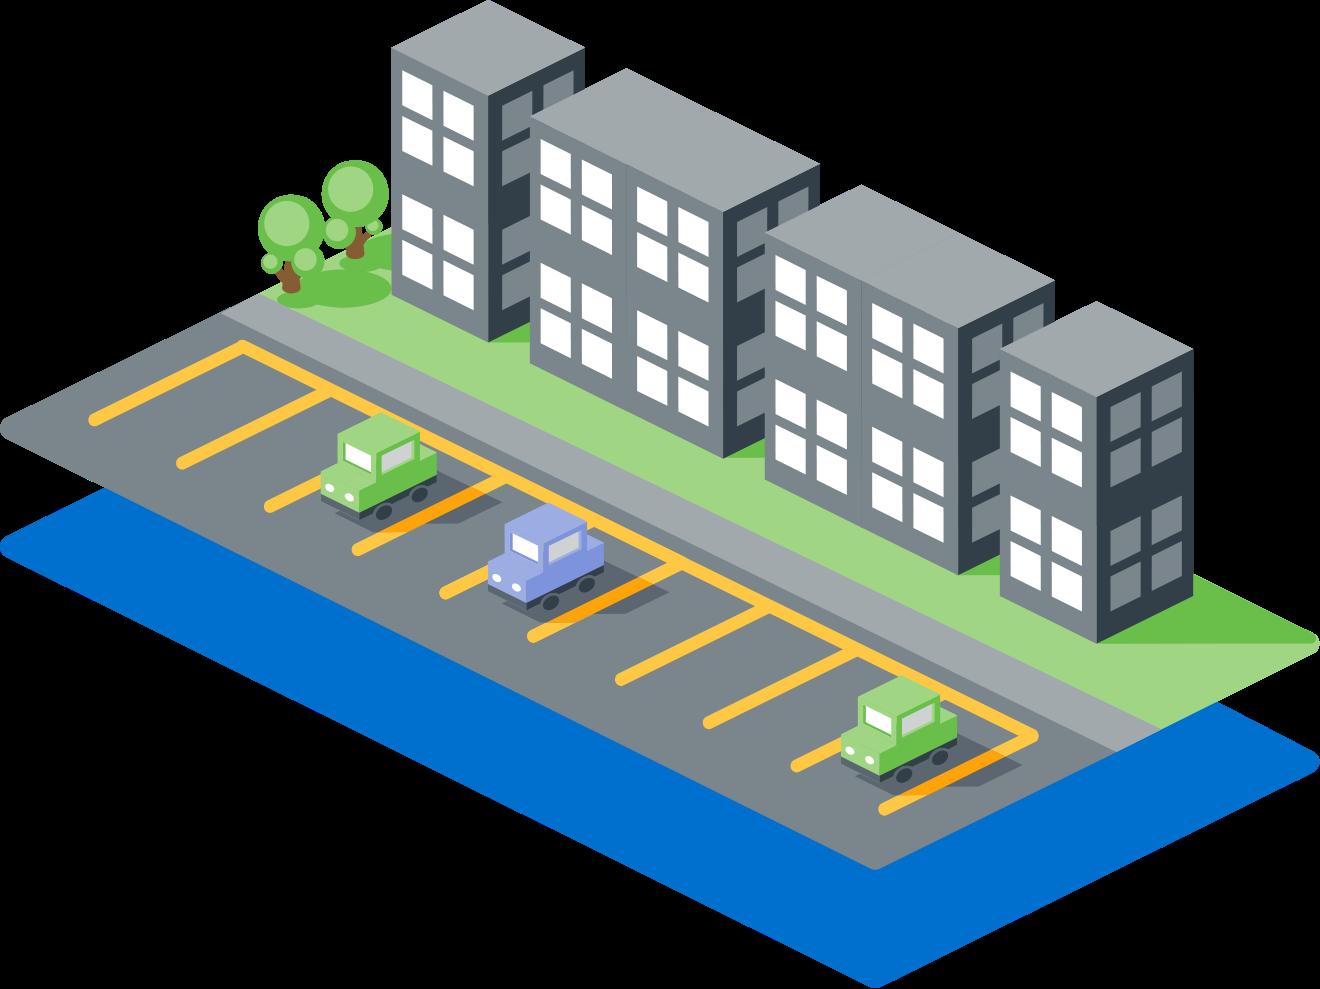 Zark Buildings